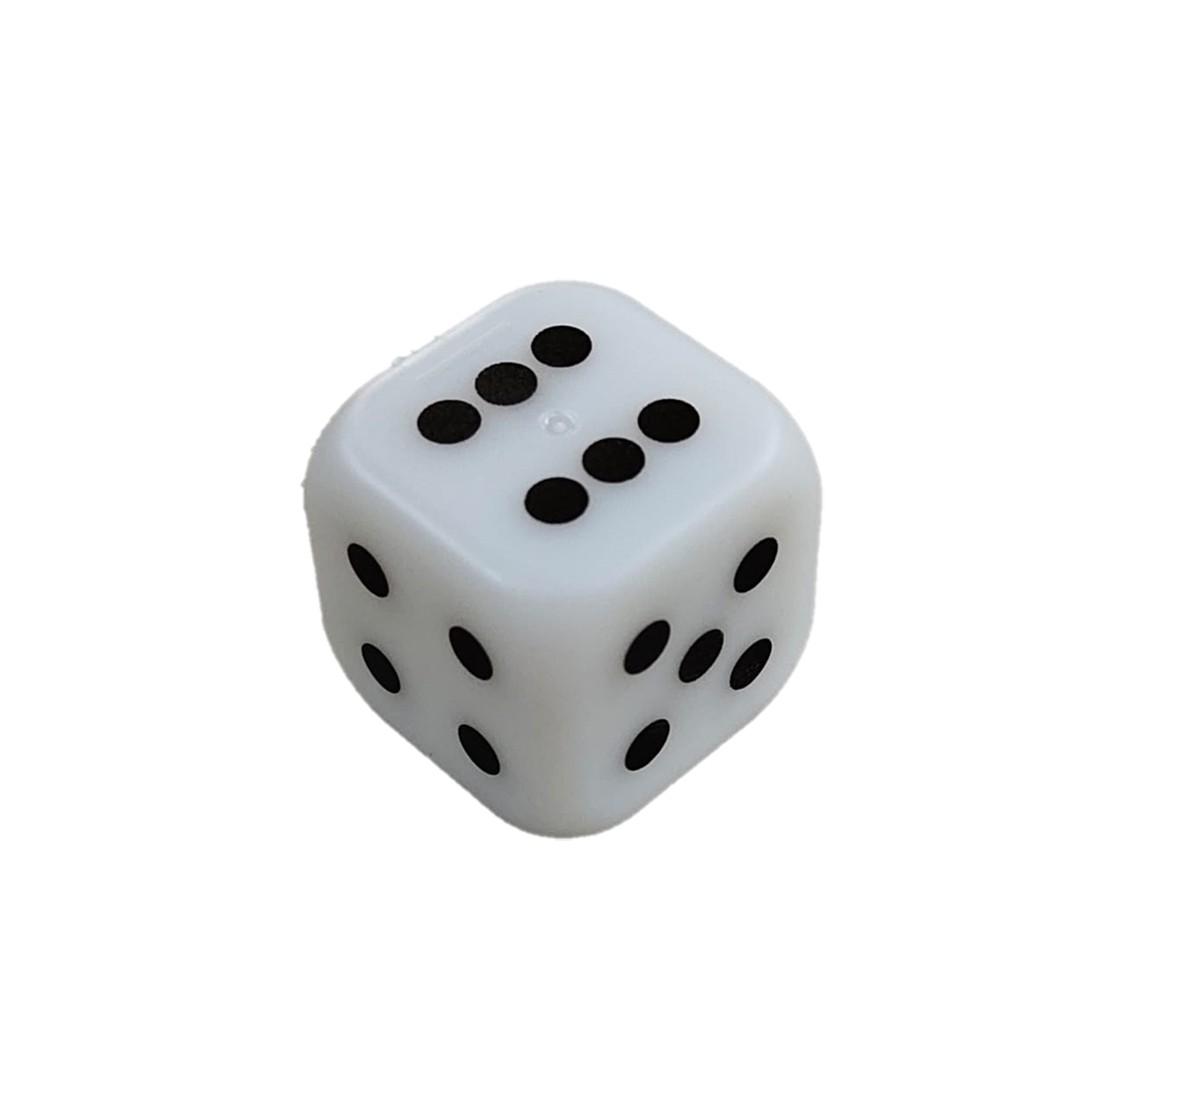 Diicii Single Dice Board Games for Kids age 4Y+